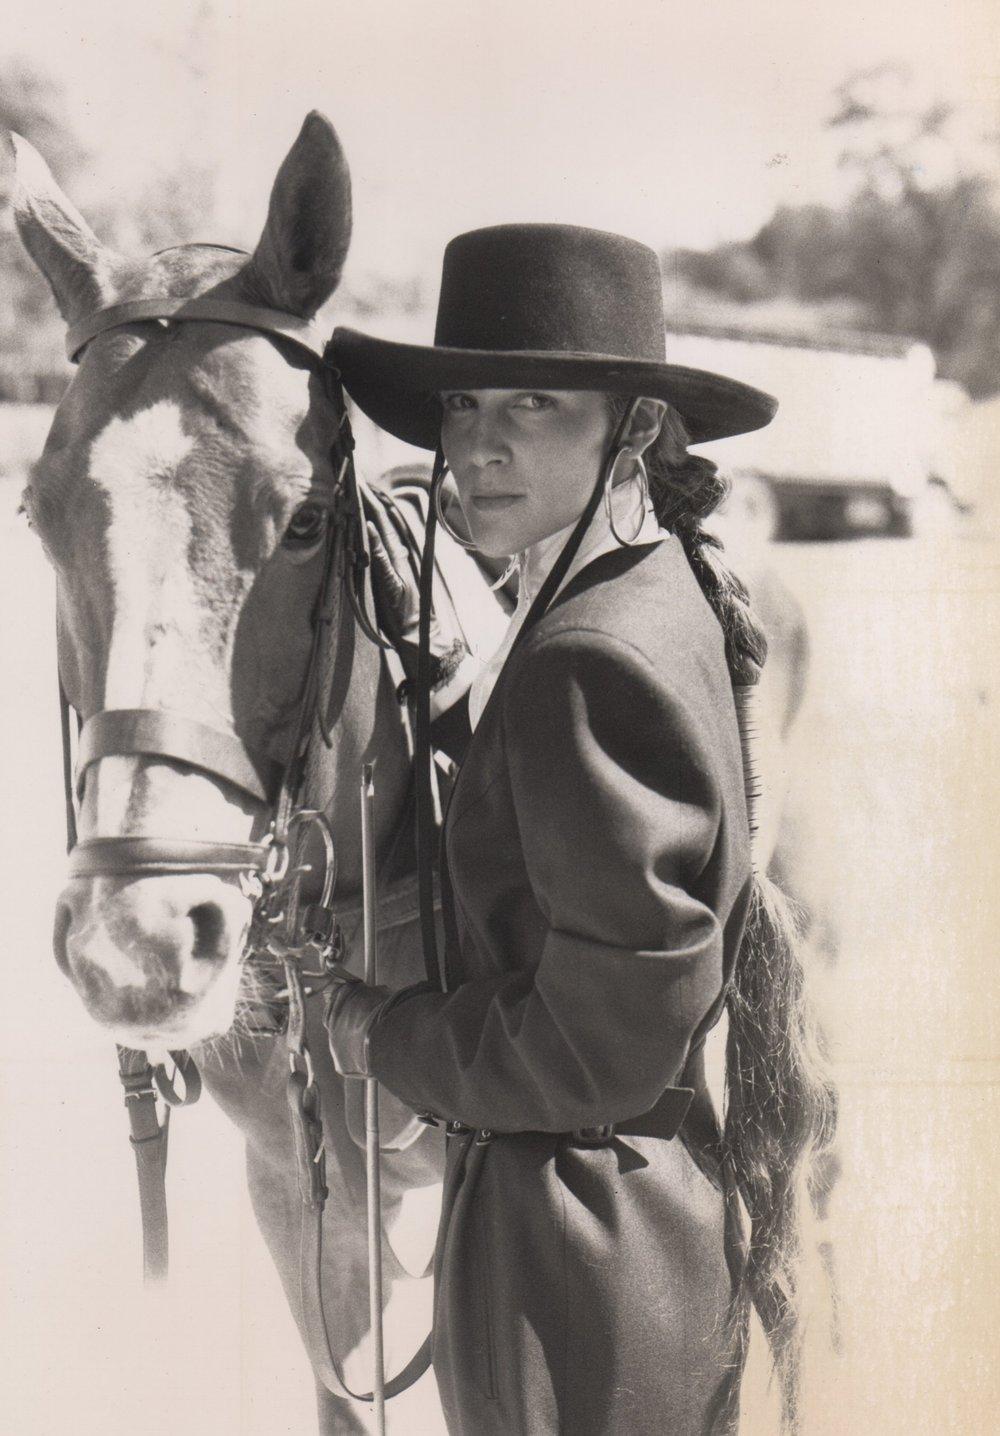 Eugenia Melian 1986